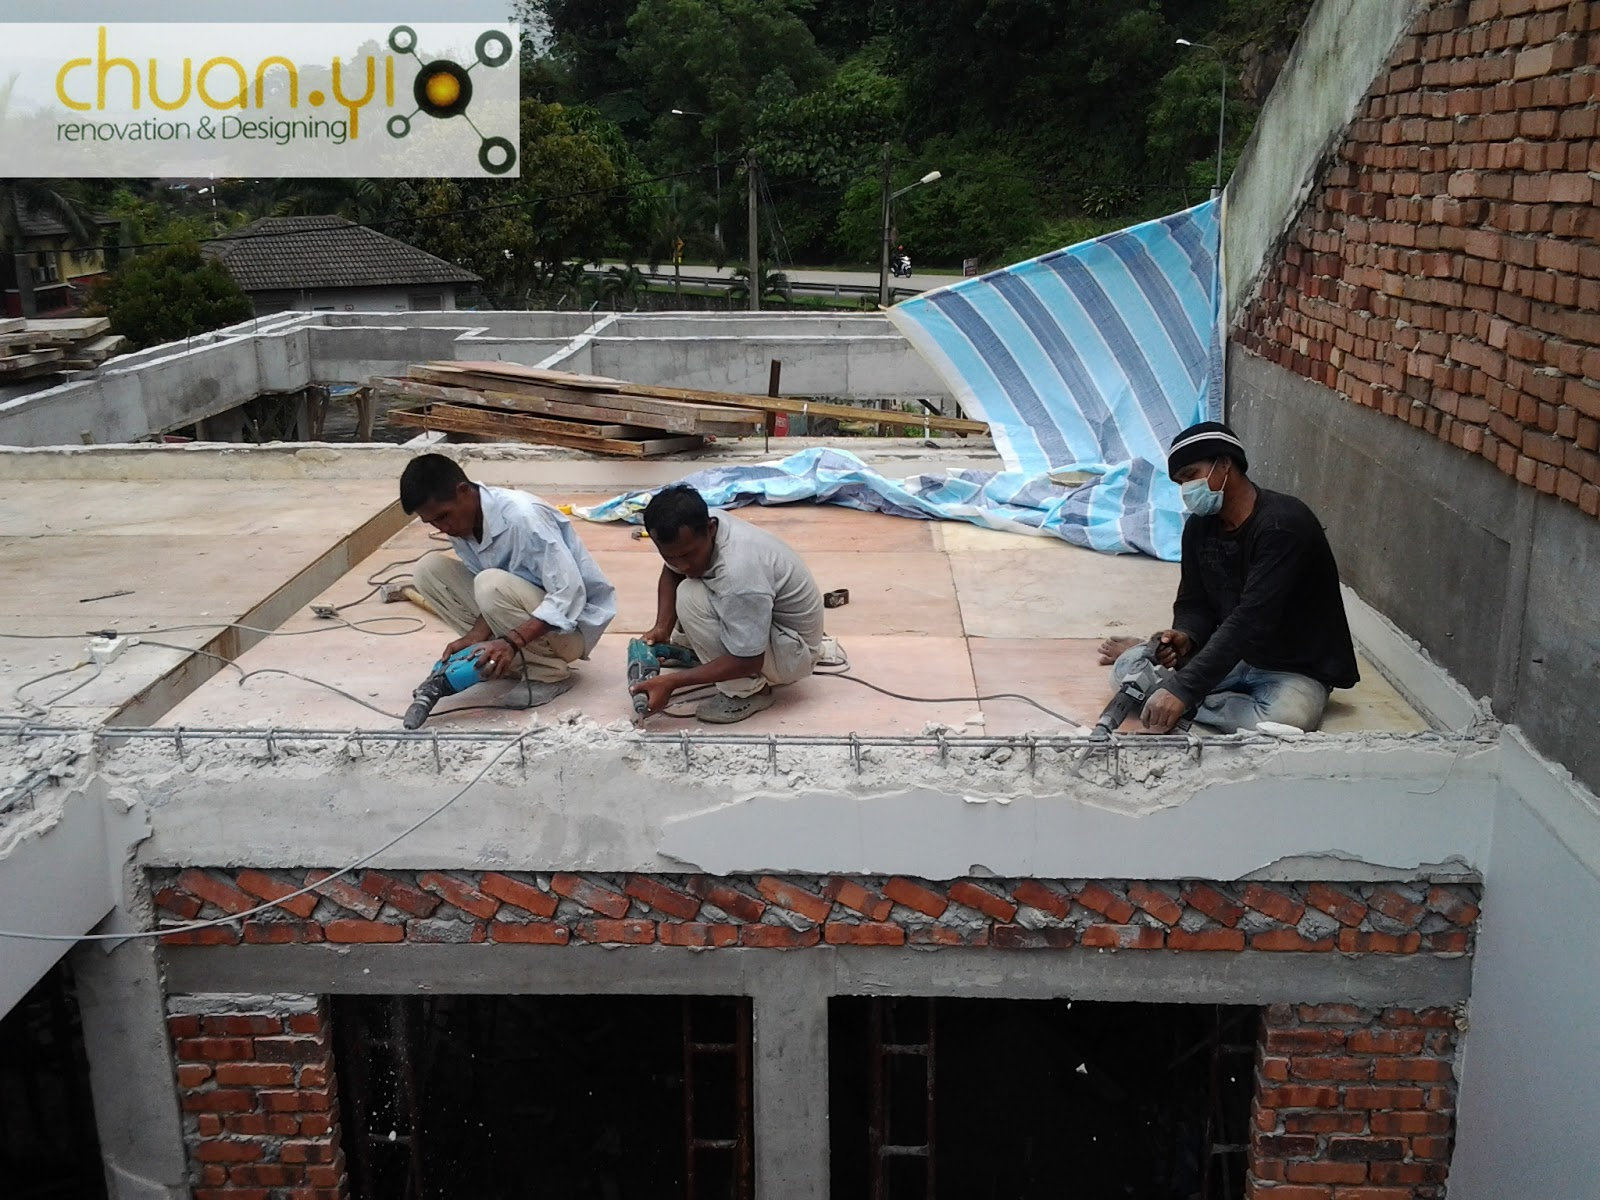 Chuan Yi Construction Amp Renovation Sdn Bhd Attic Floor